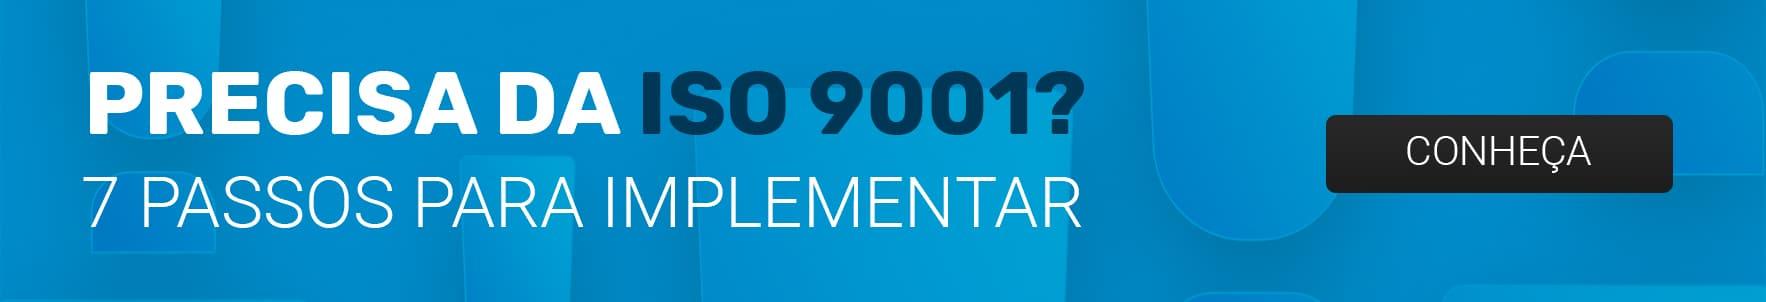 certificacao iso 9001 - 7 passos